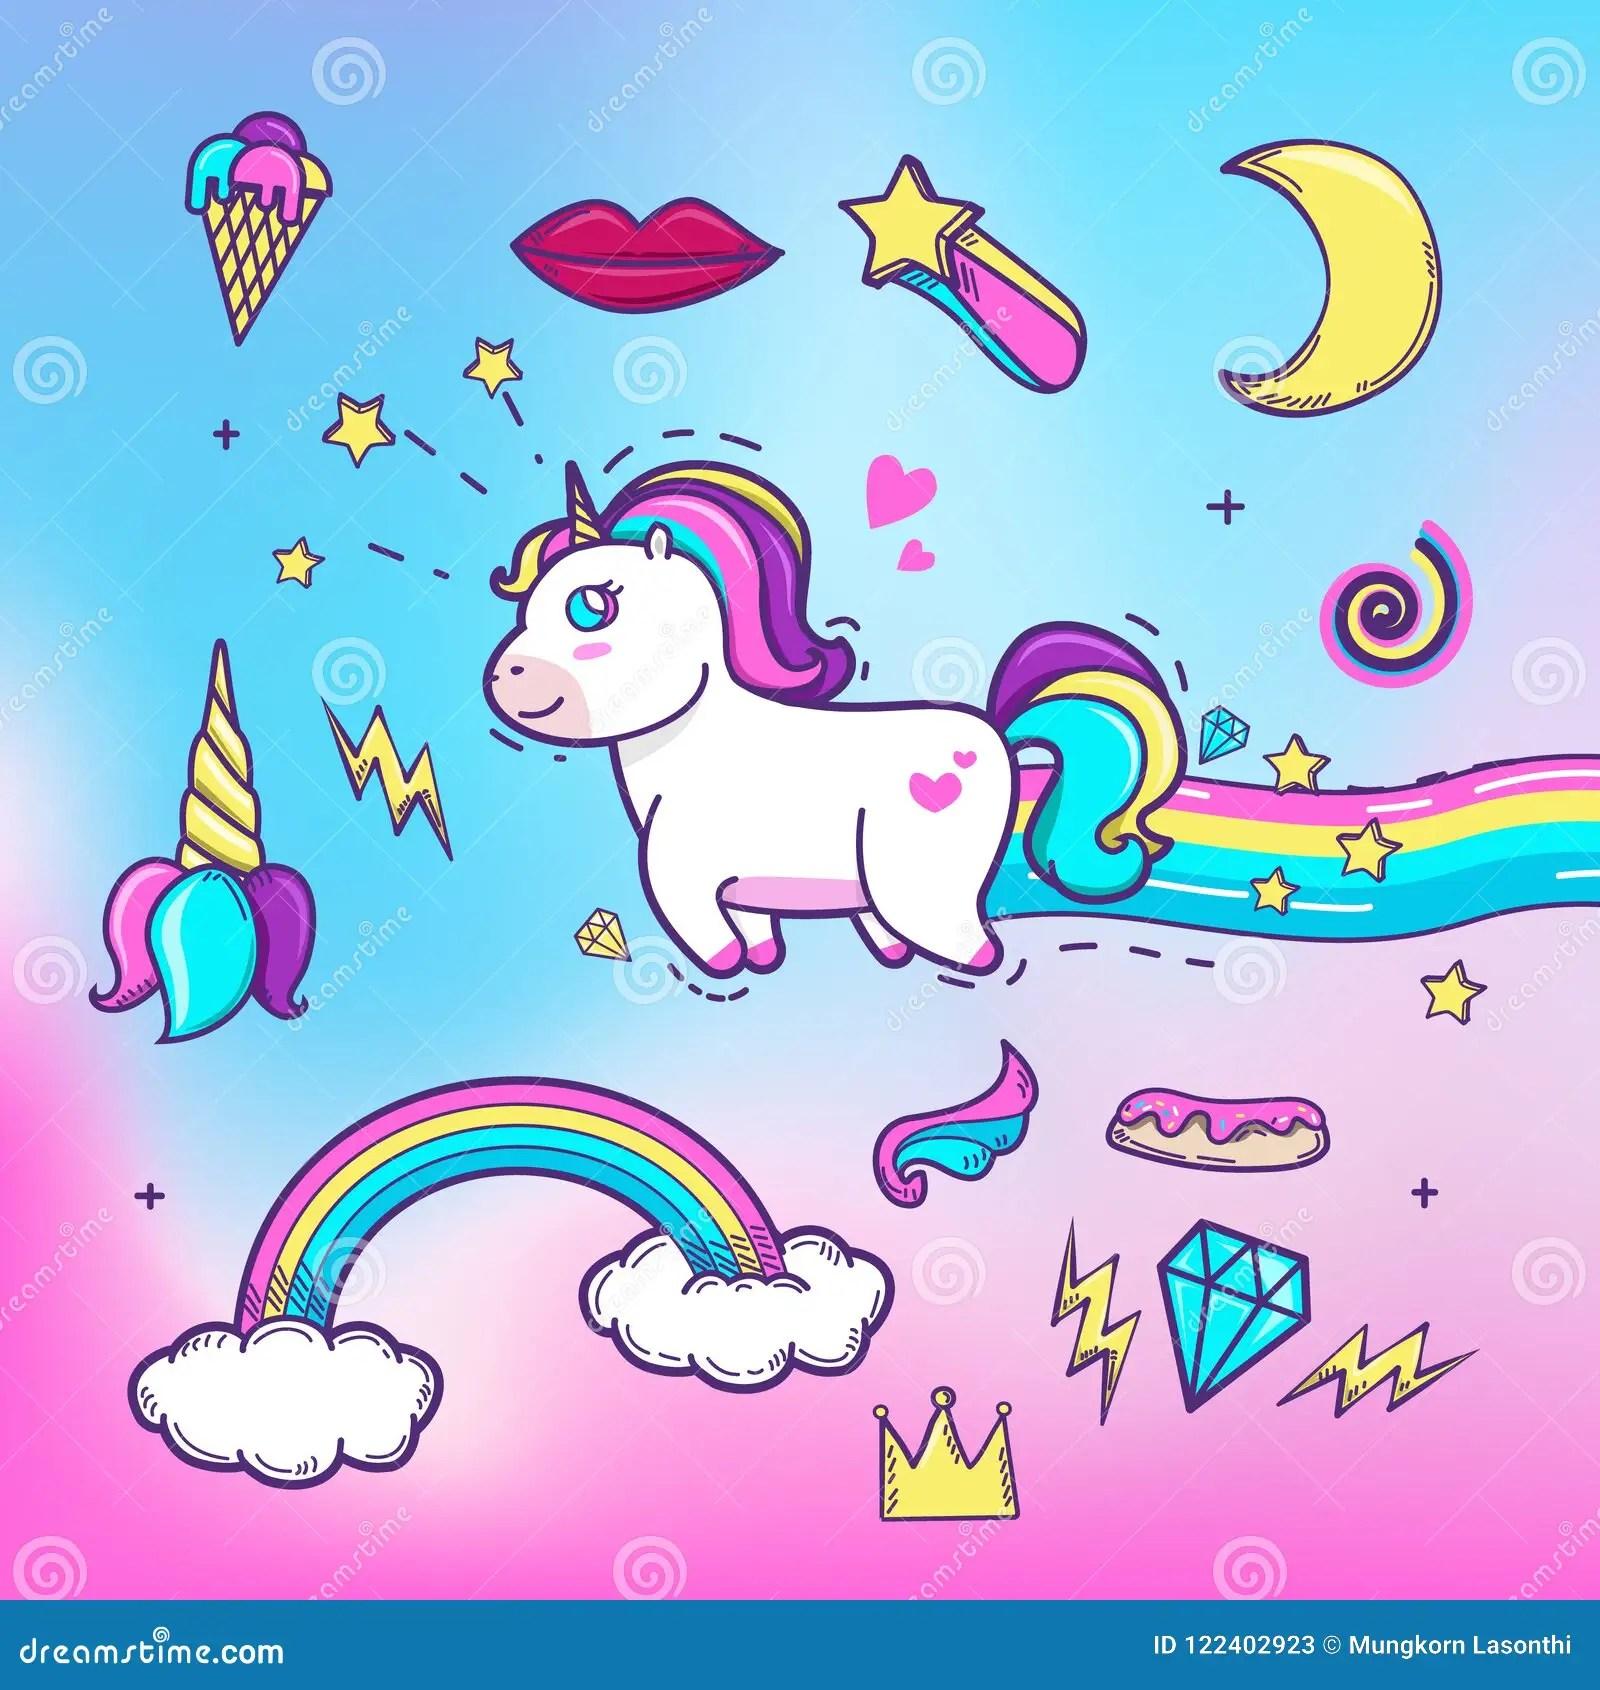 Cartoon Hand Drawn Unicorn With Elements Cute Unicorn With